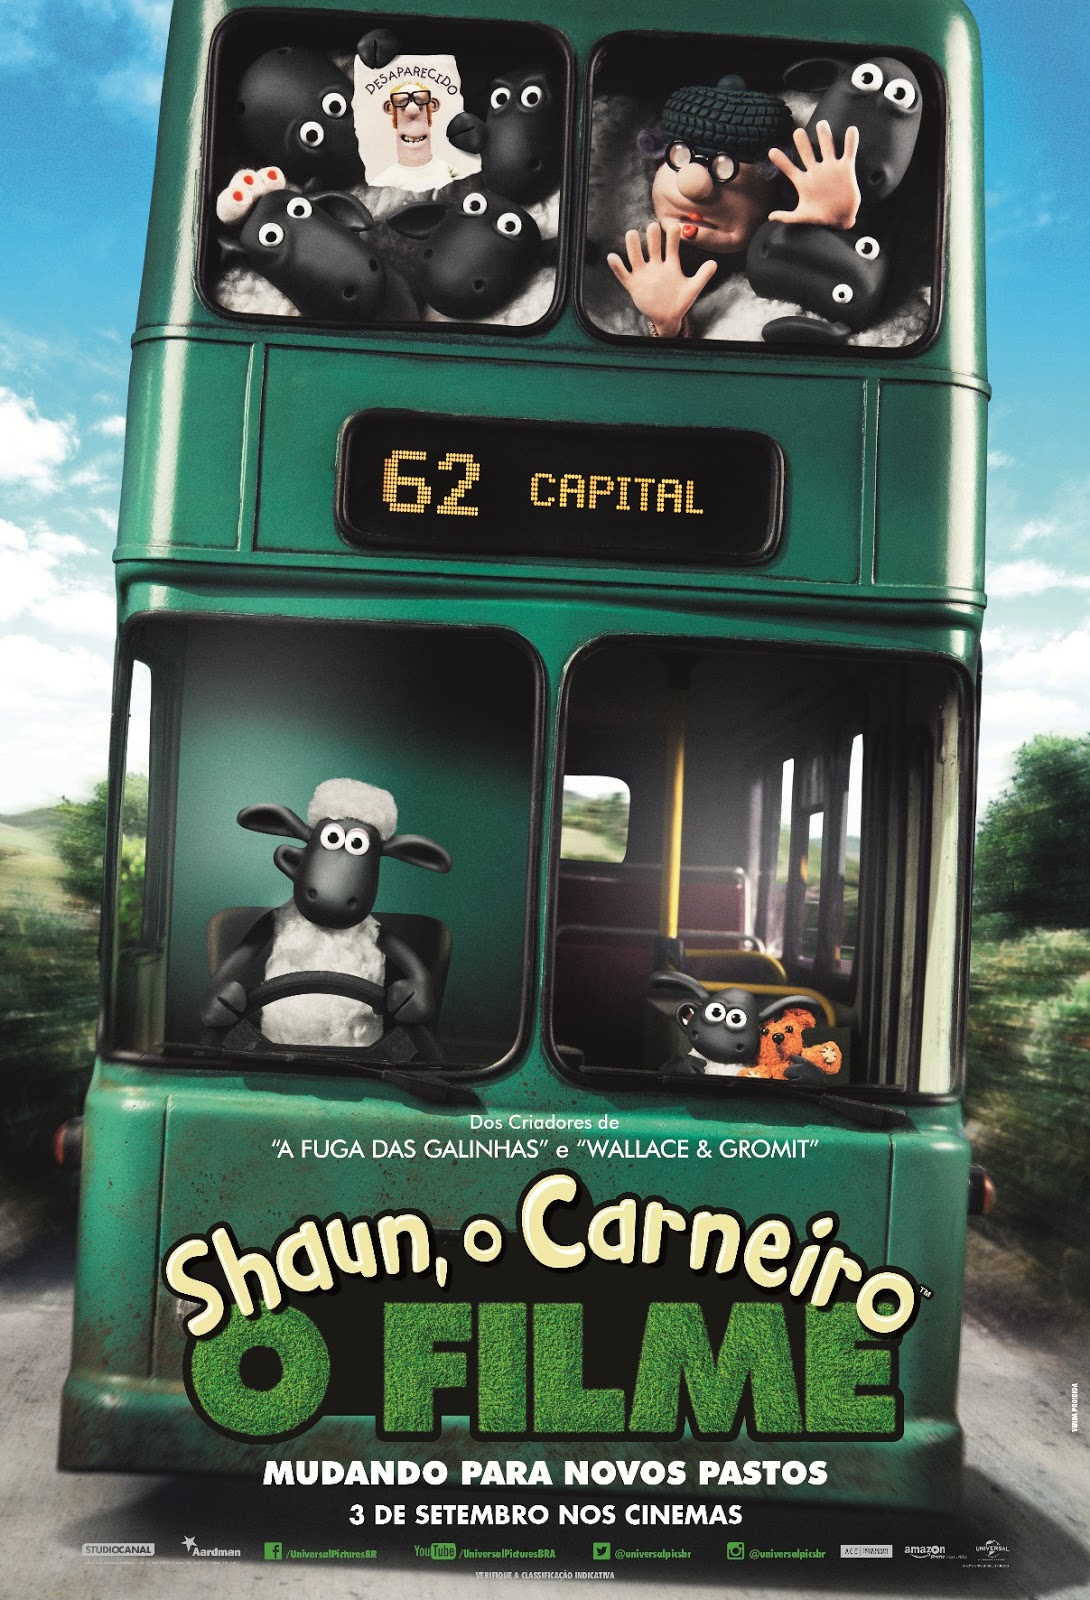 Shaun: O Carneiro – Filme – HD 720p